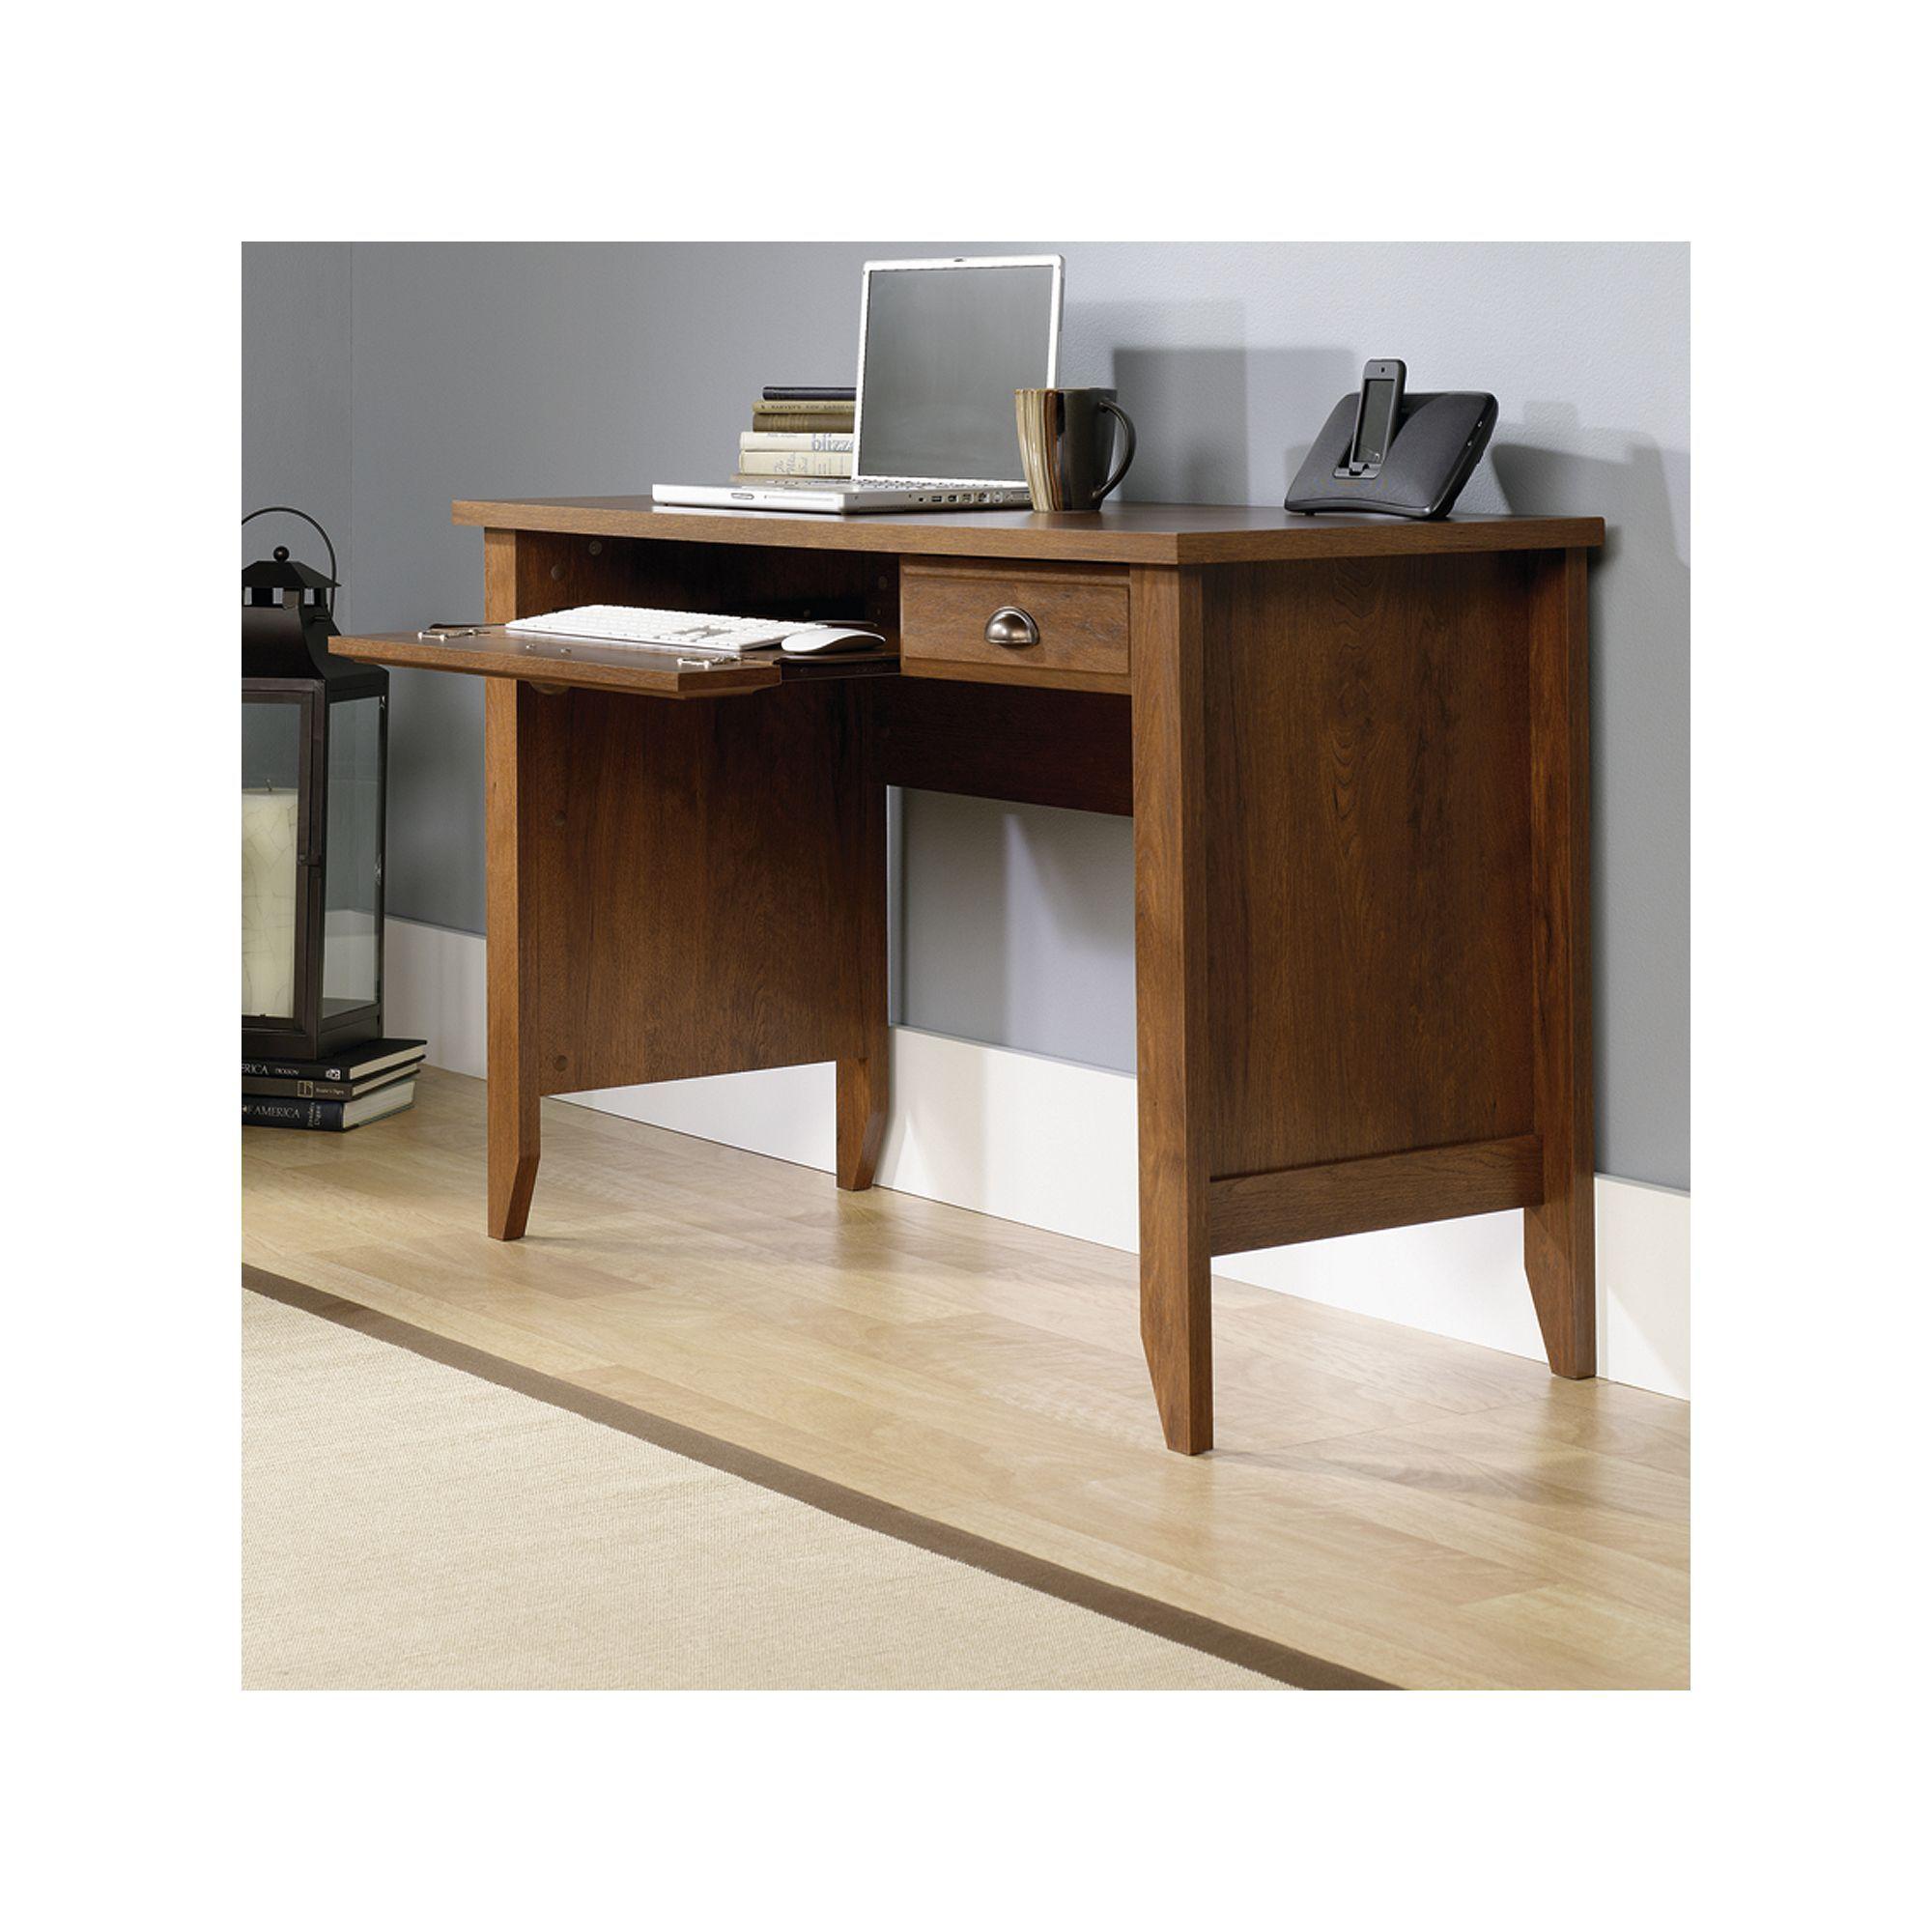 Sauder Shoal Creek Desk In 2019 Oak Computer Desk Desk With